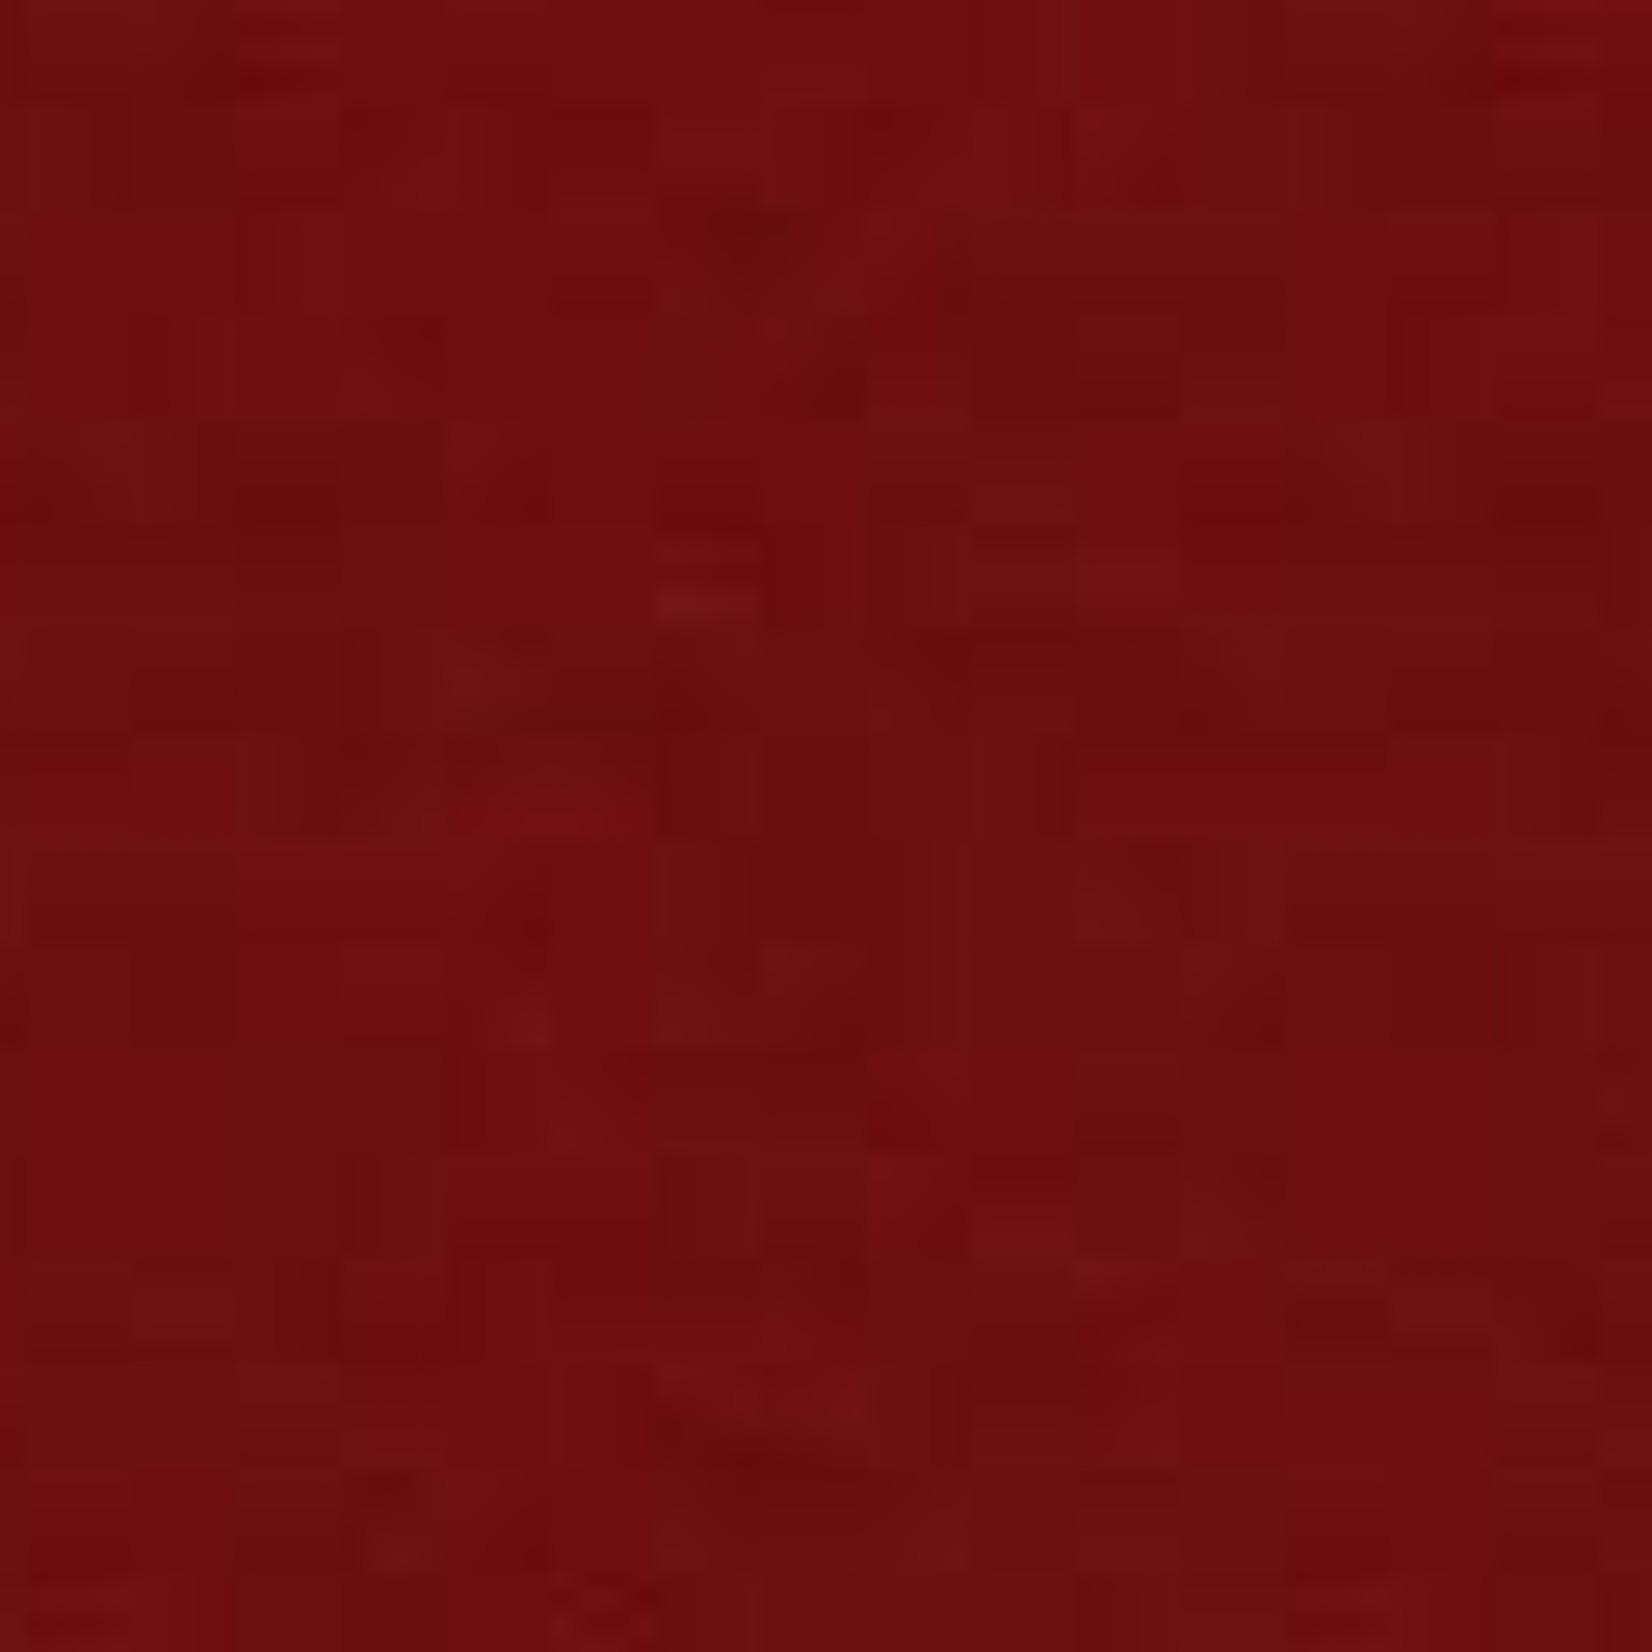 "Bazzill Bazzill 12"" x 12"" Canvas Cardstock Blush Red Dark"